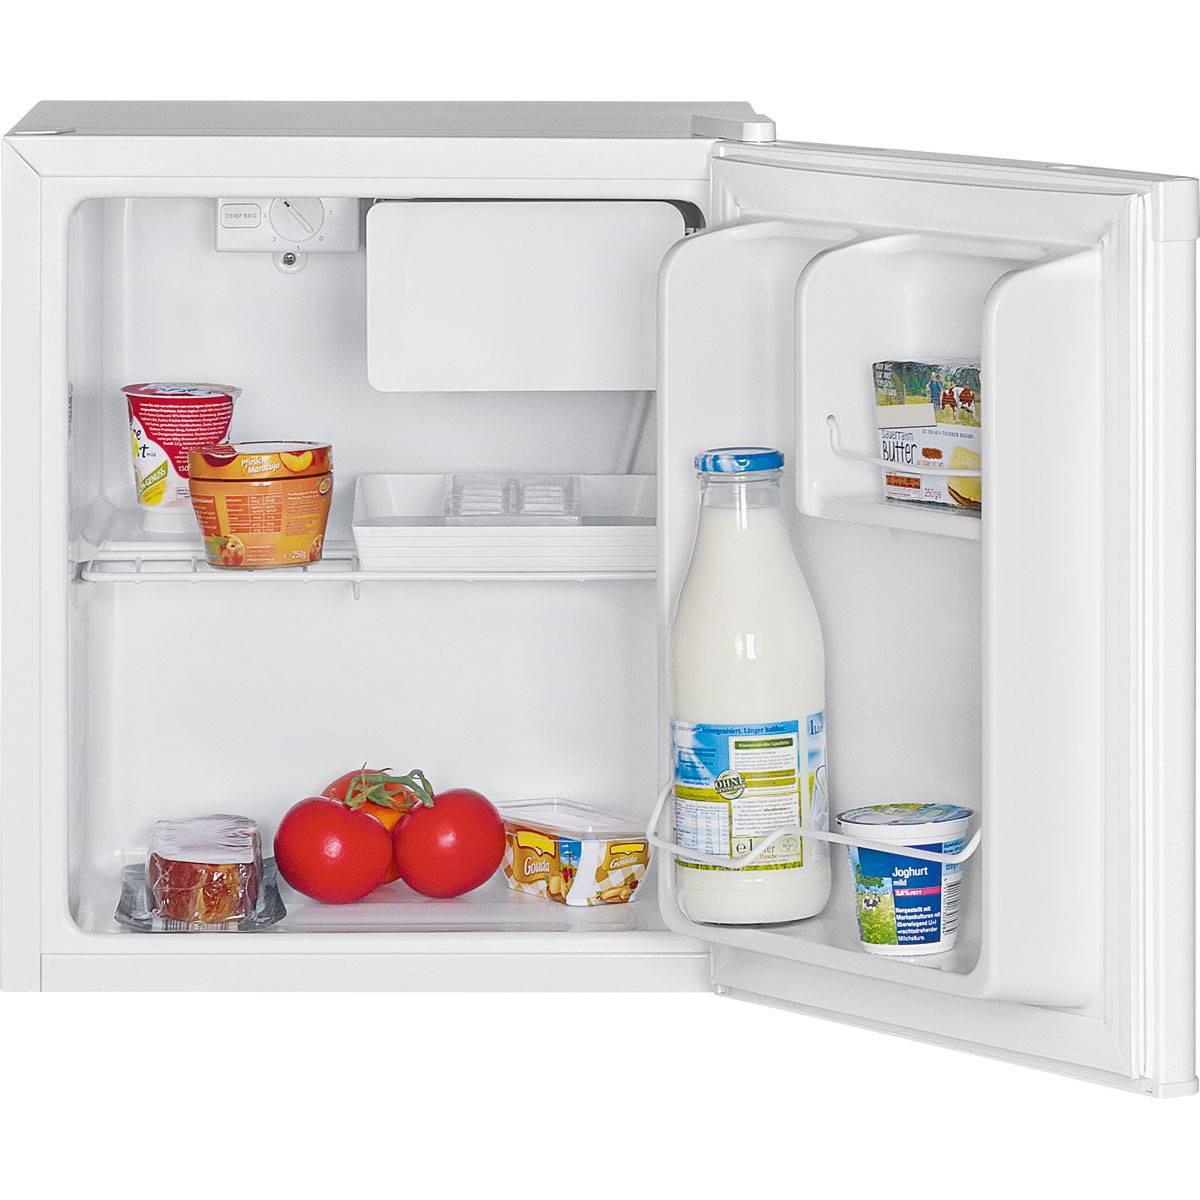 Bomann KB 389 - Mini bar nevera independiente con cogelador 42 litros, A++ , color blanco